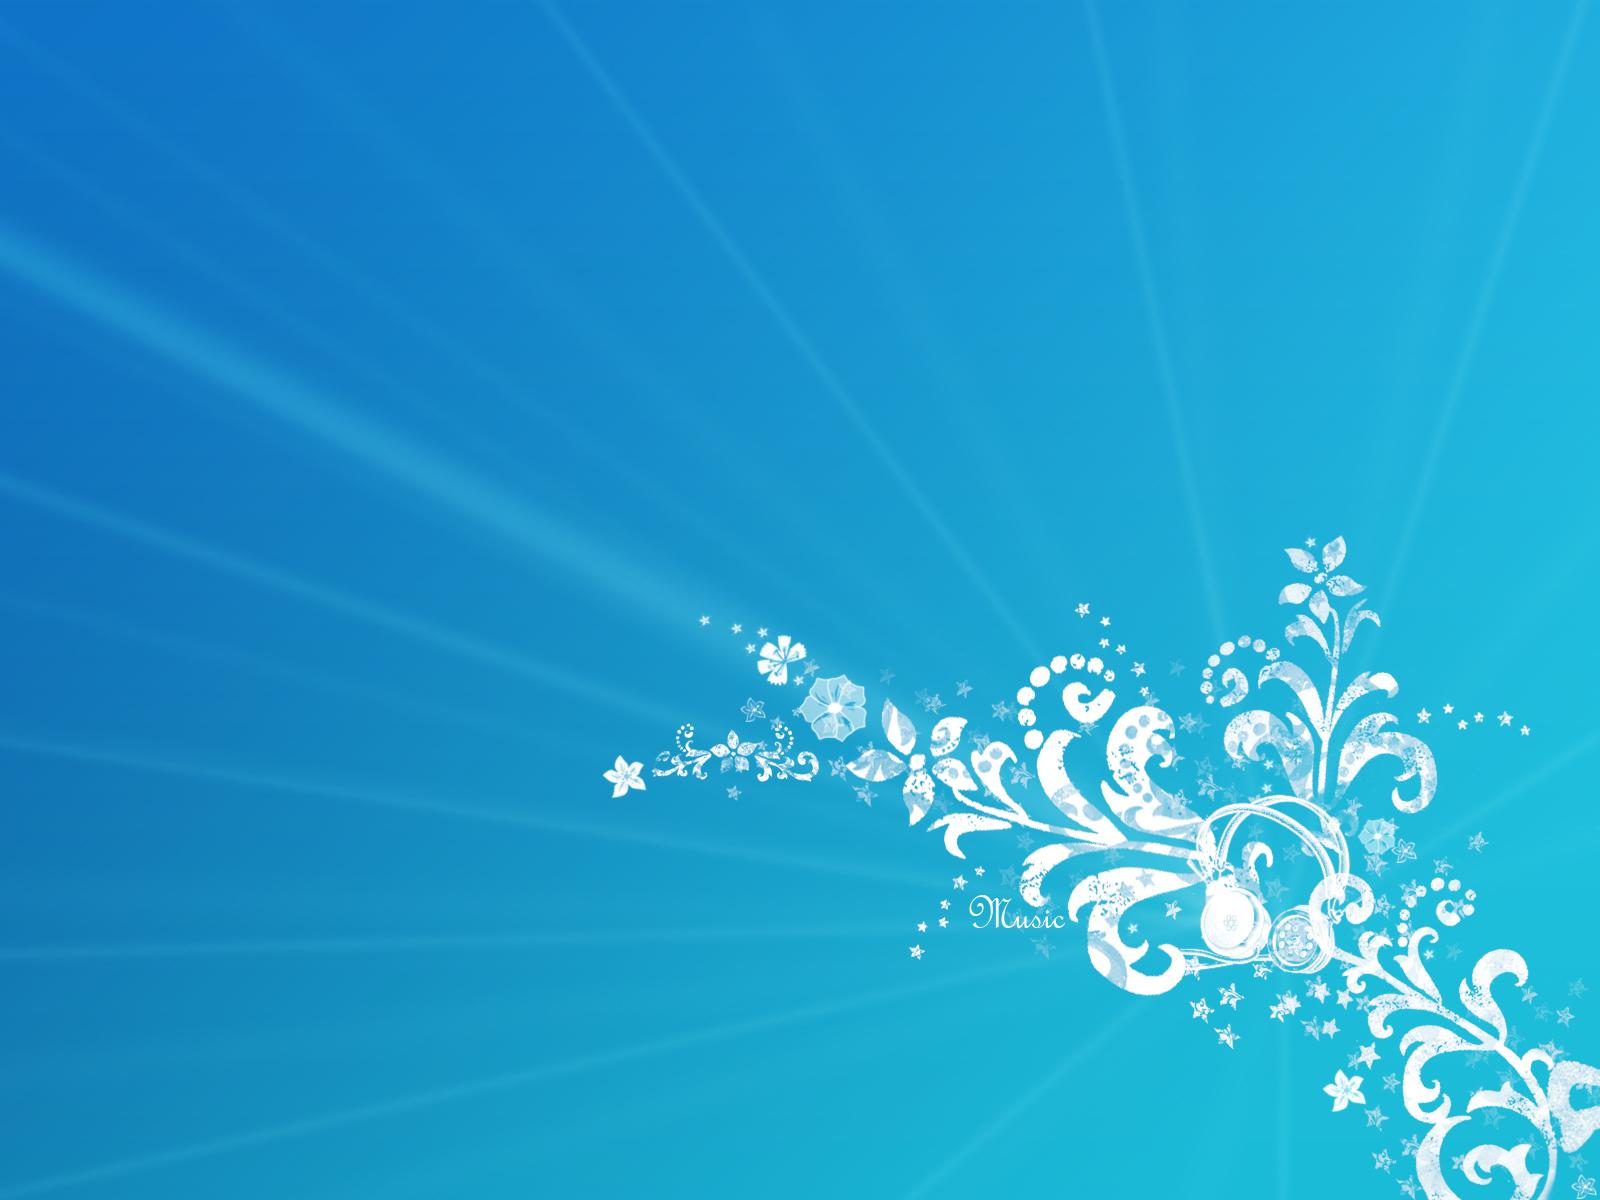 http://1.bp.blogspot.com/-jY07na9vczs/TlXdo3_s6pI/AAAAAAAAAMg/fuz3Age_STc/s1600/free-Abstract-Wallpaper.jpg